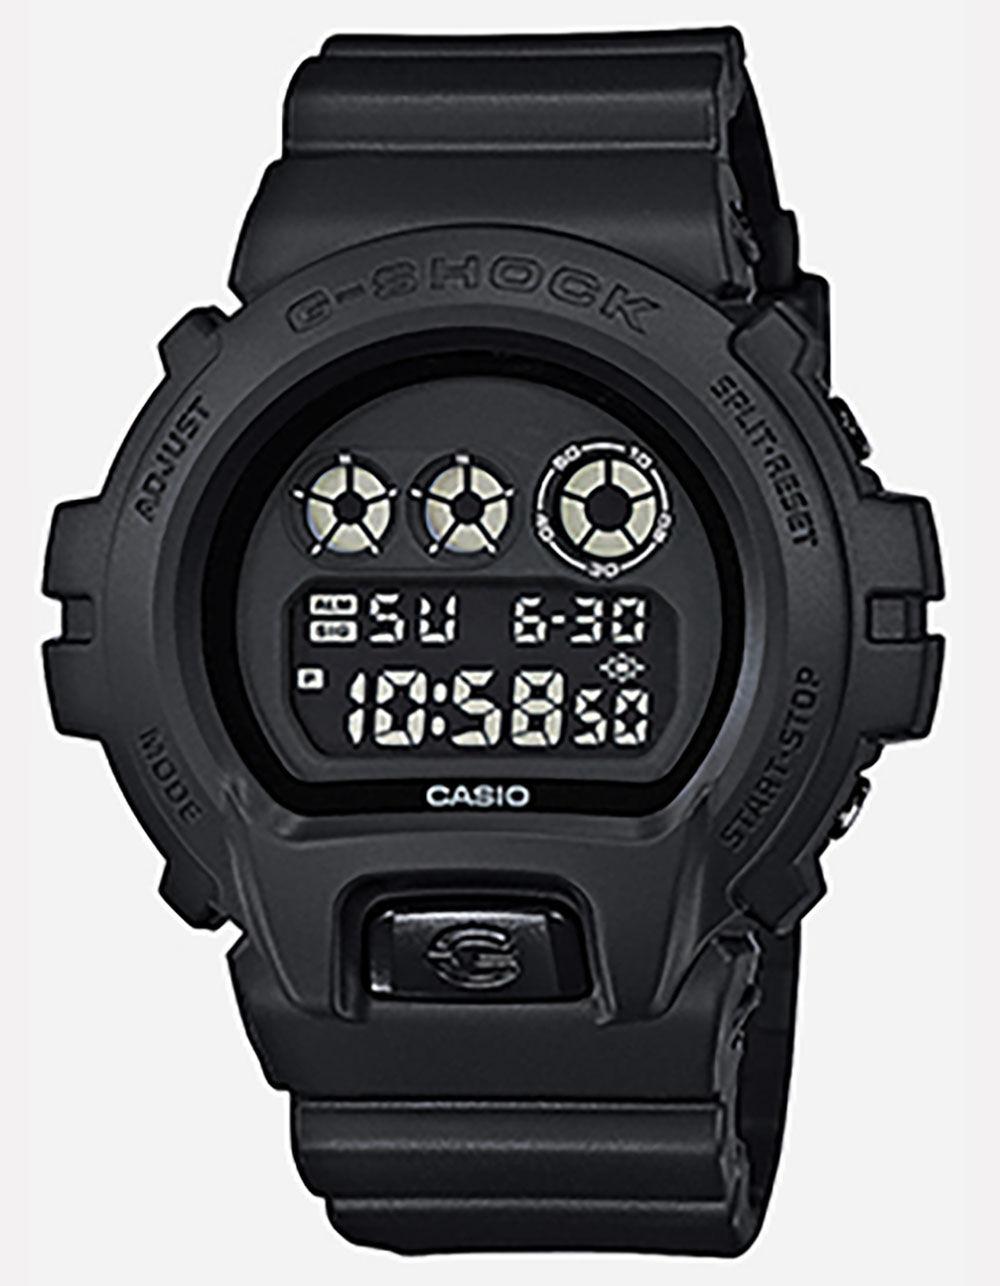 G-SHOCK DW6900BB-1 Watch